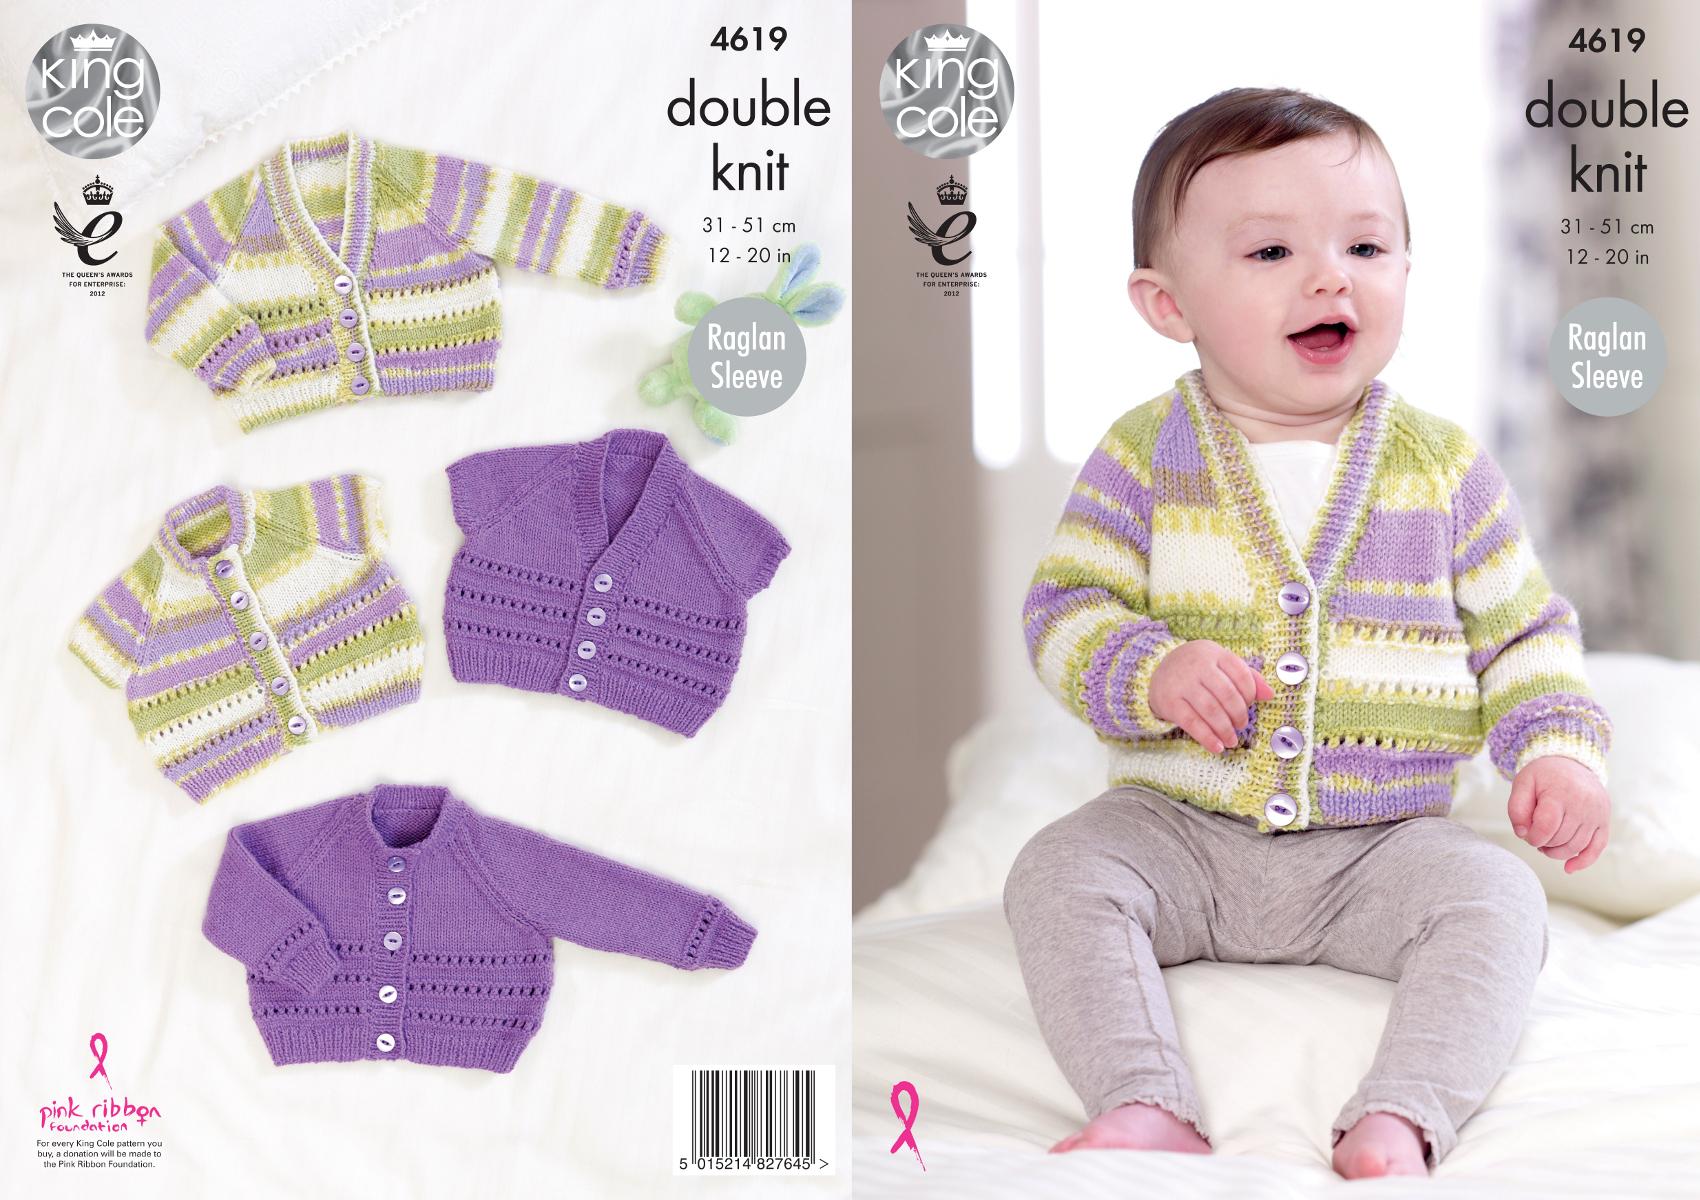 Baby raglan sleeve lace cardigans double knitting pattern king baby raglan sleeve lace cardigans double knitting pattern king cole dk 4619 bankloansurffo Choice Image